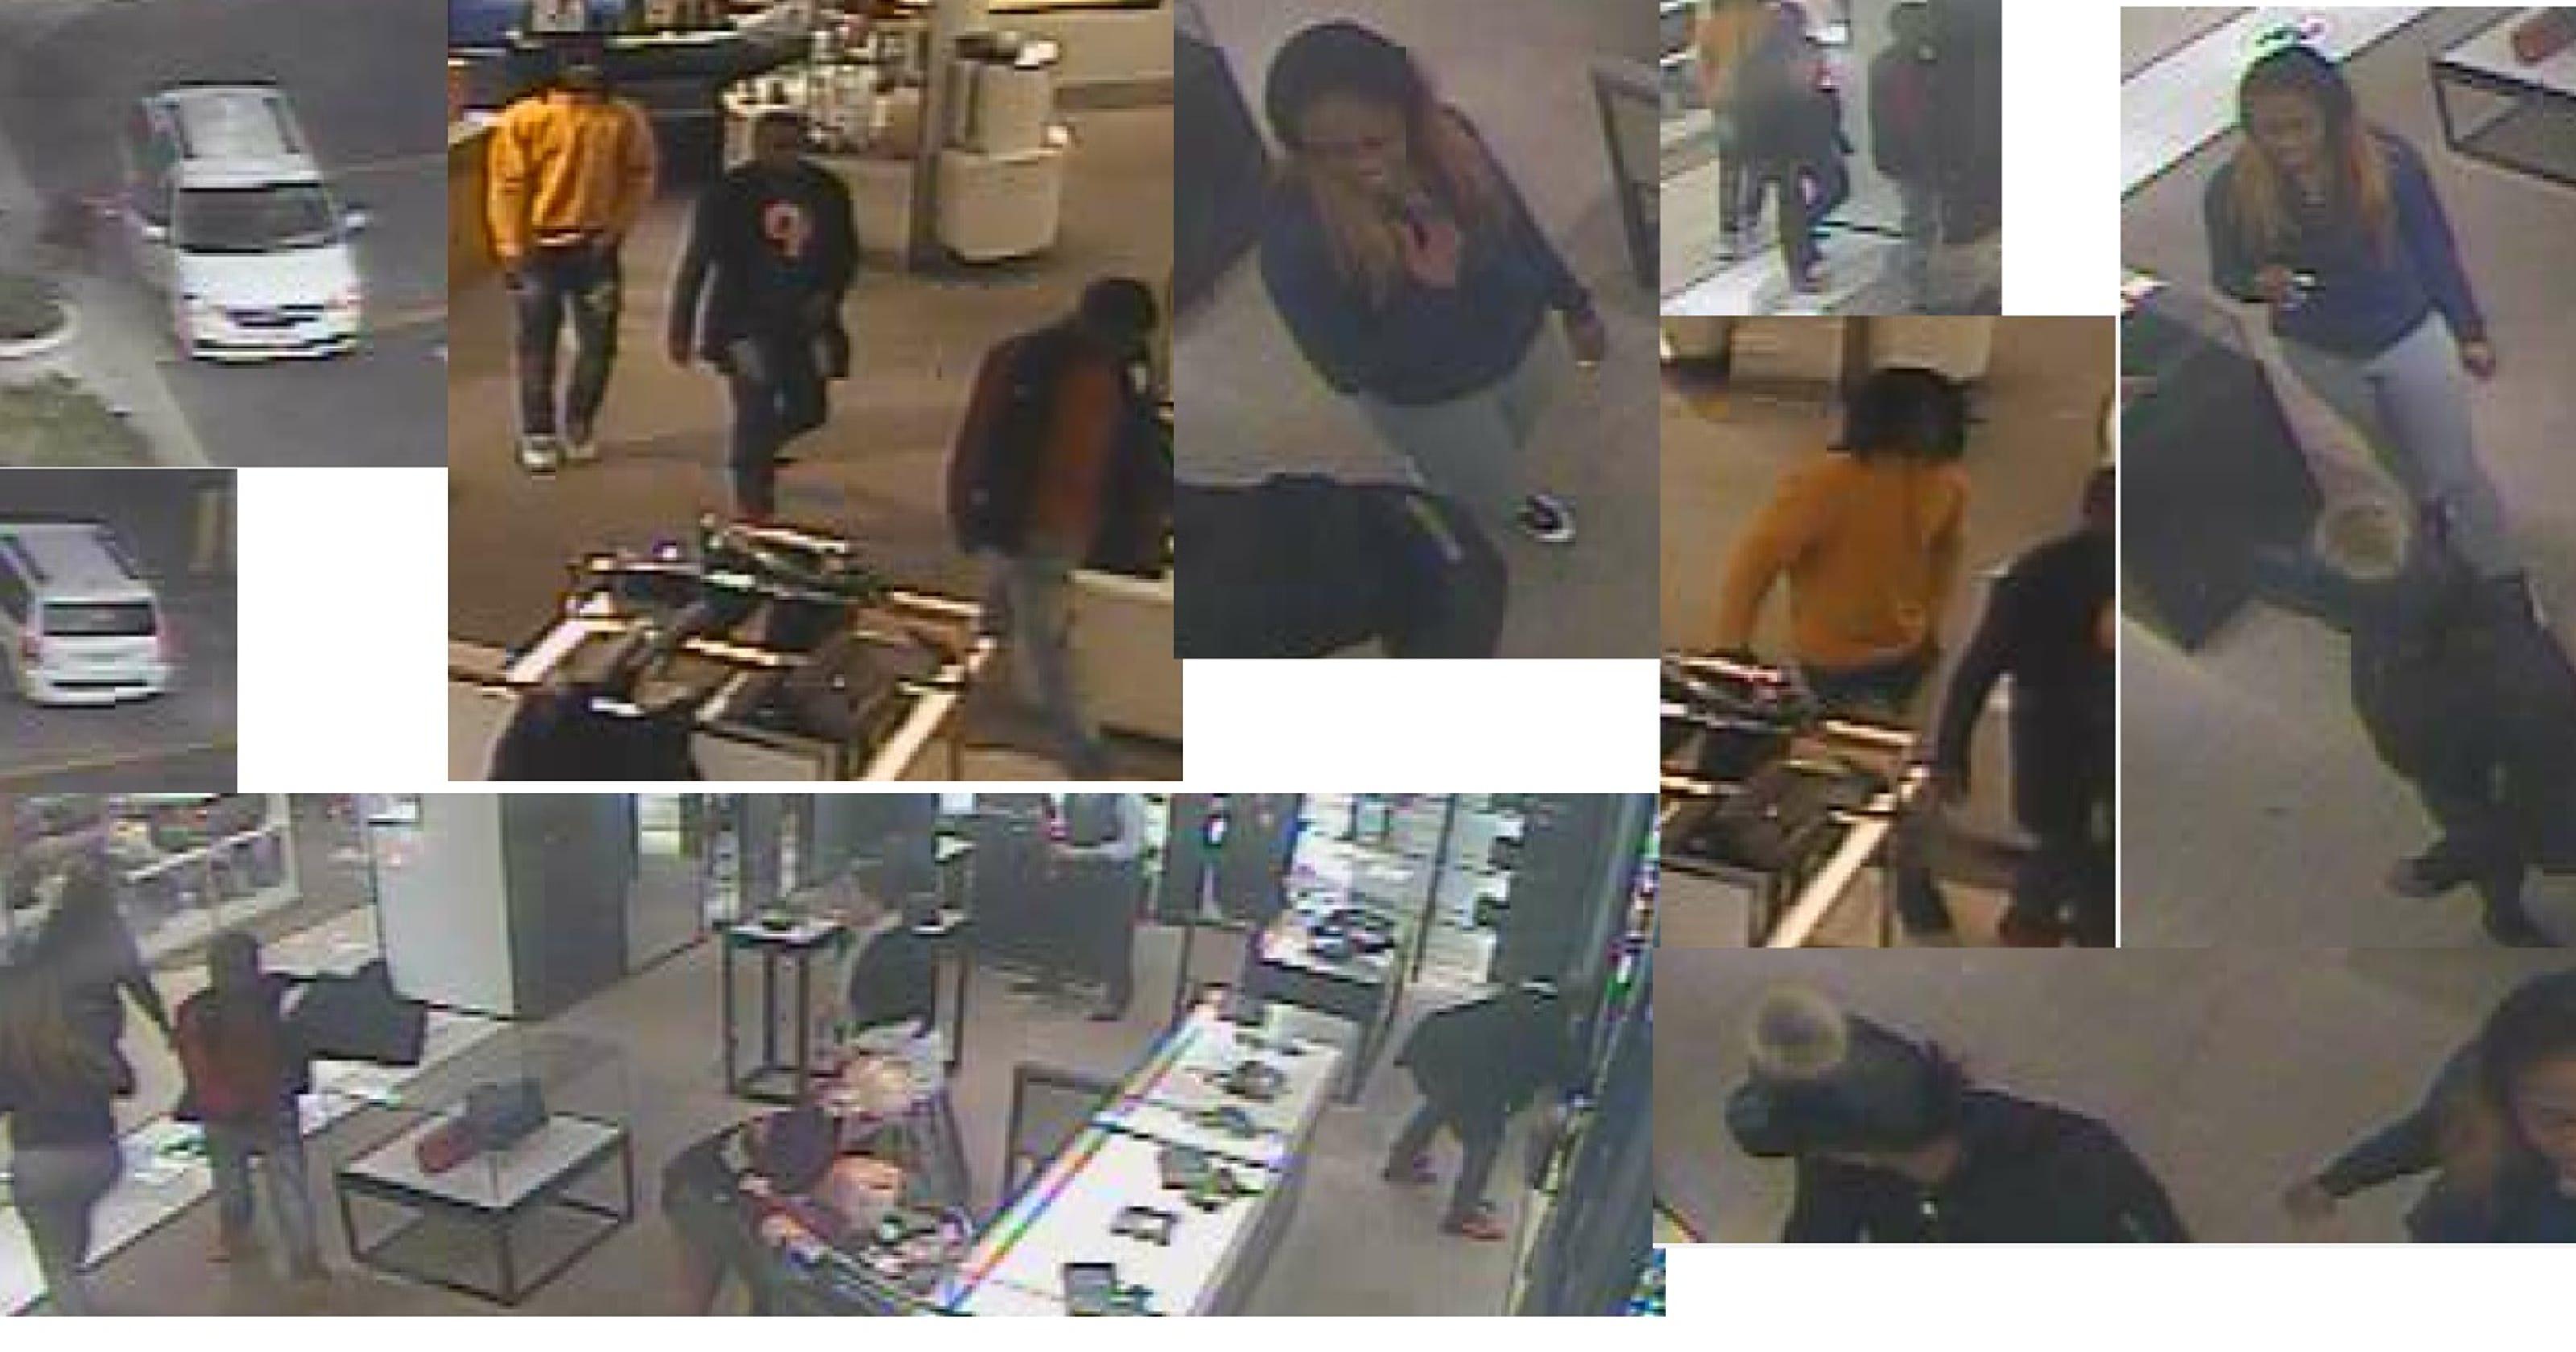 e5c369ac554940 Watch Nashville Nordstrom $50K purse theft in broad daylight